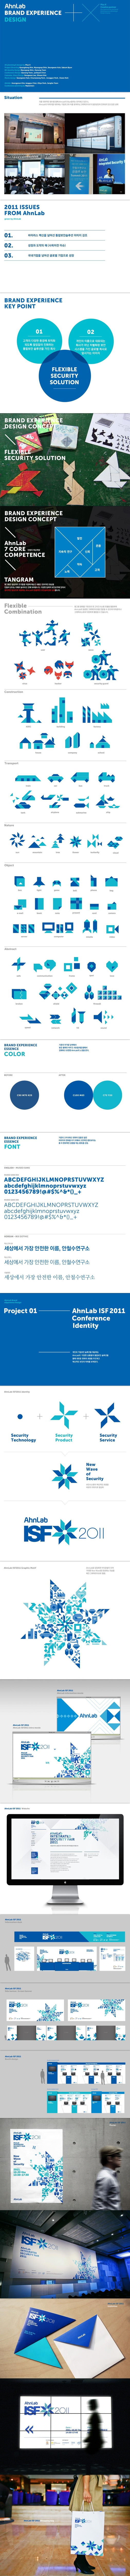 Plus X – AhnLab Brand eXperience Design